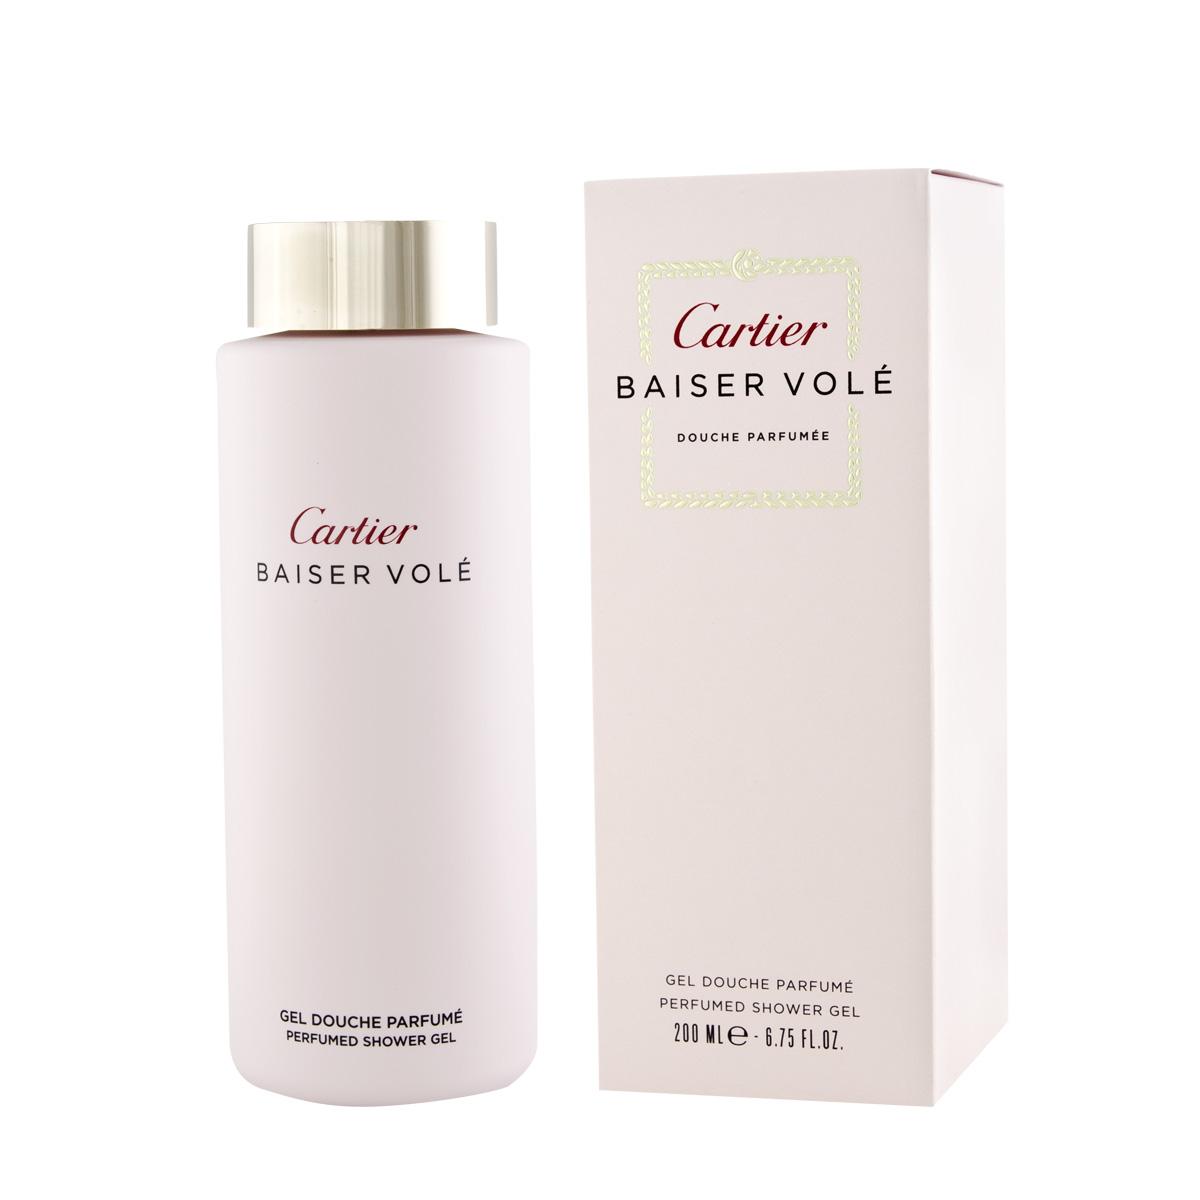 Cartier Baiser Volé SG 200 ml W